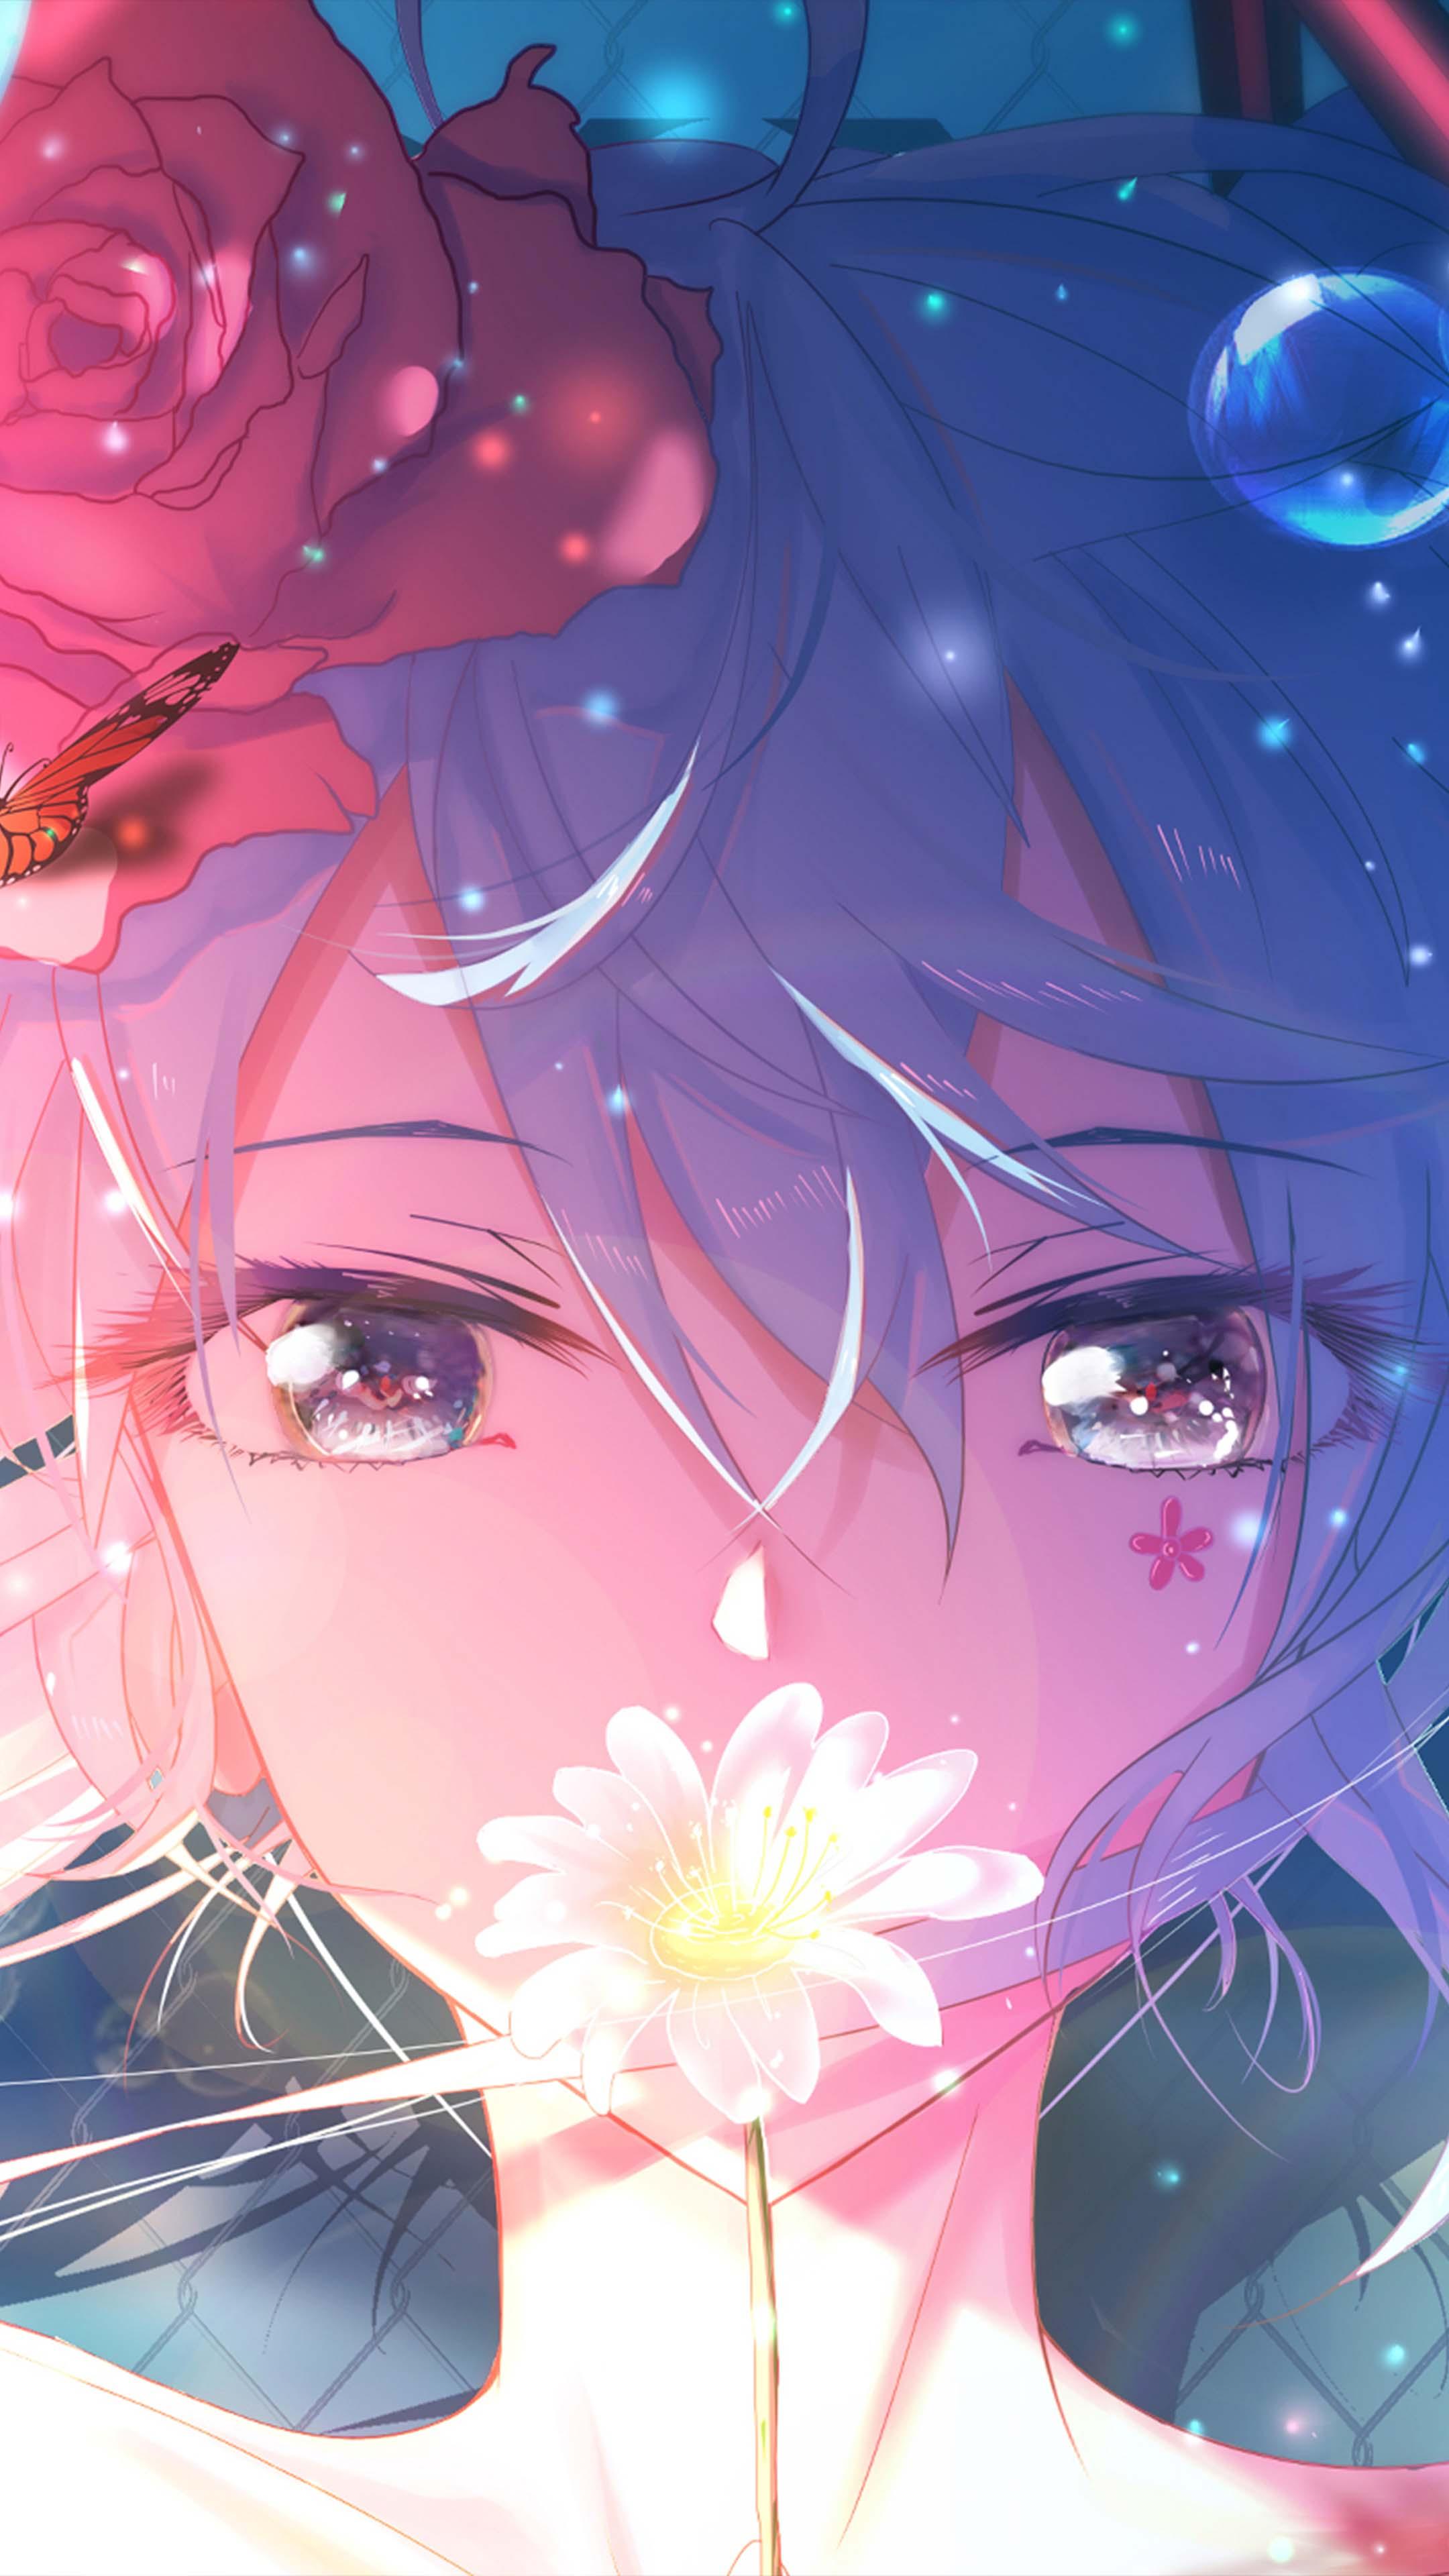 Anime Girl Wallpaper 4k Hd Wallpaper Backgrounds Download